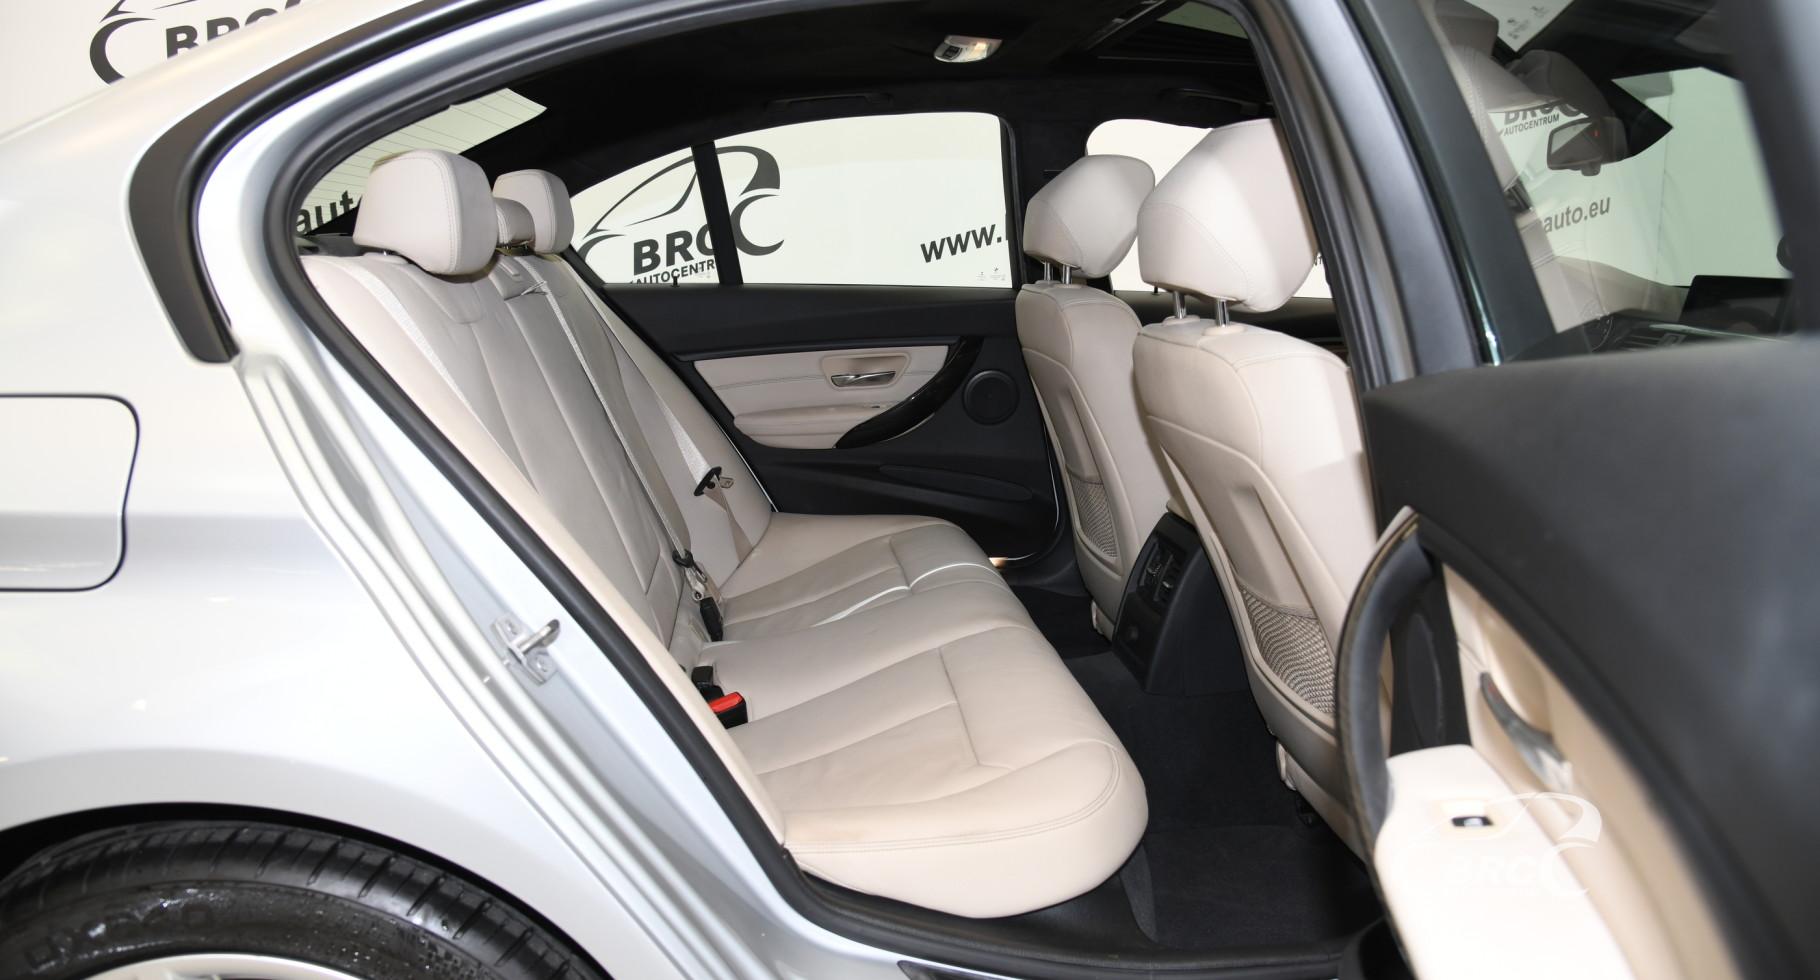 BMW 328 i M-packet Automatas